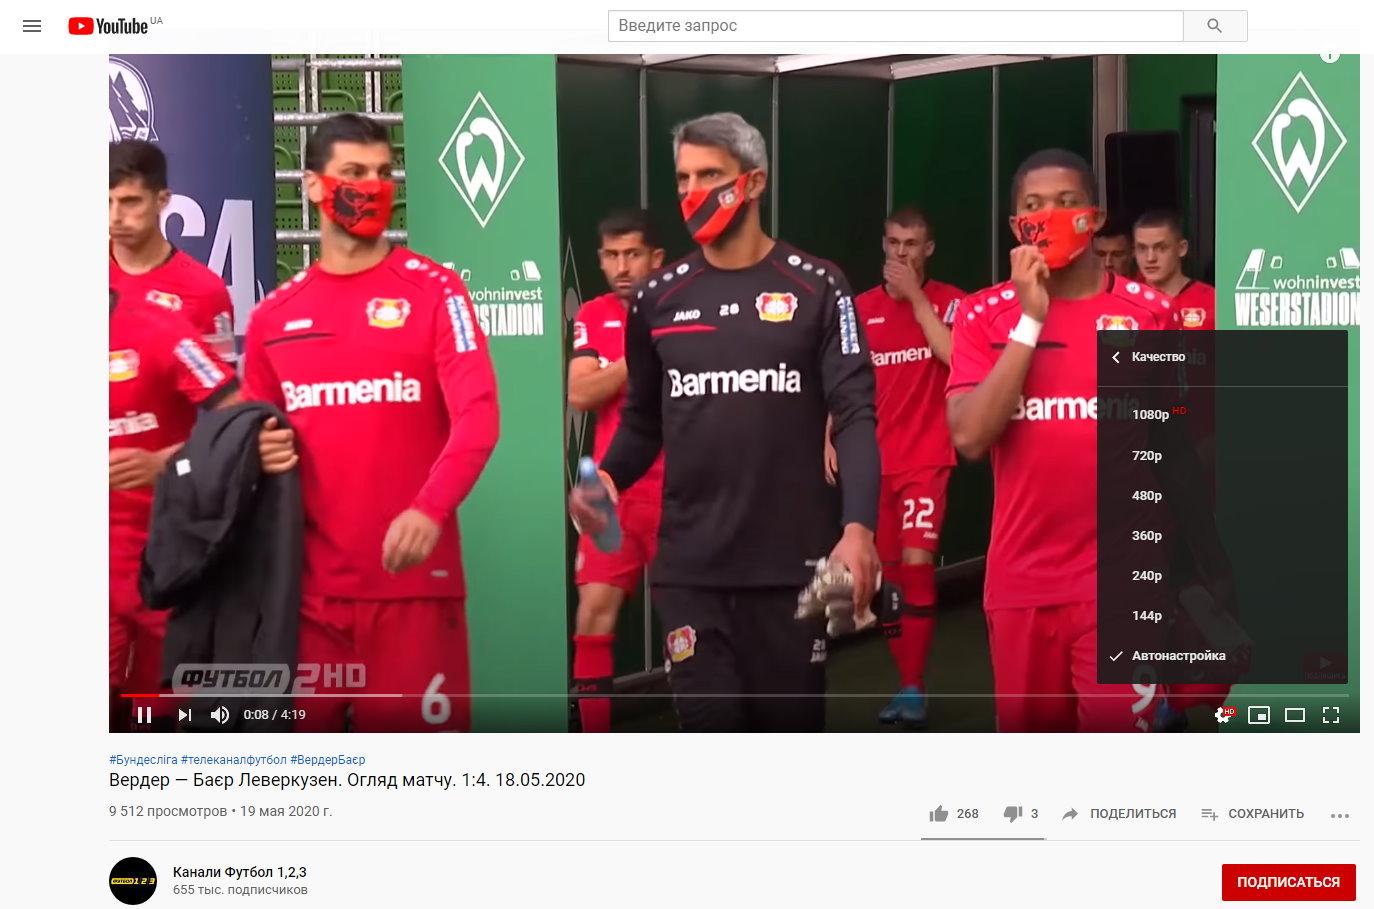 YouTube 720p not HD